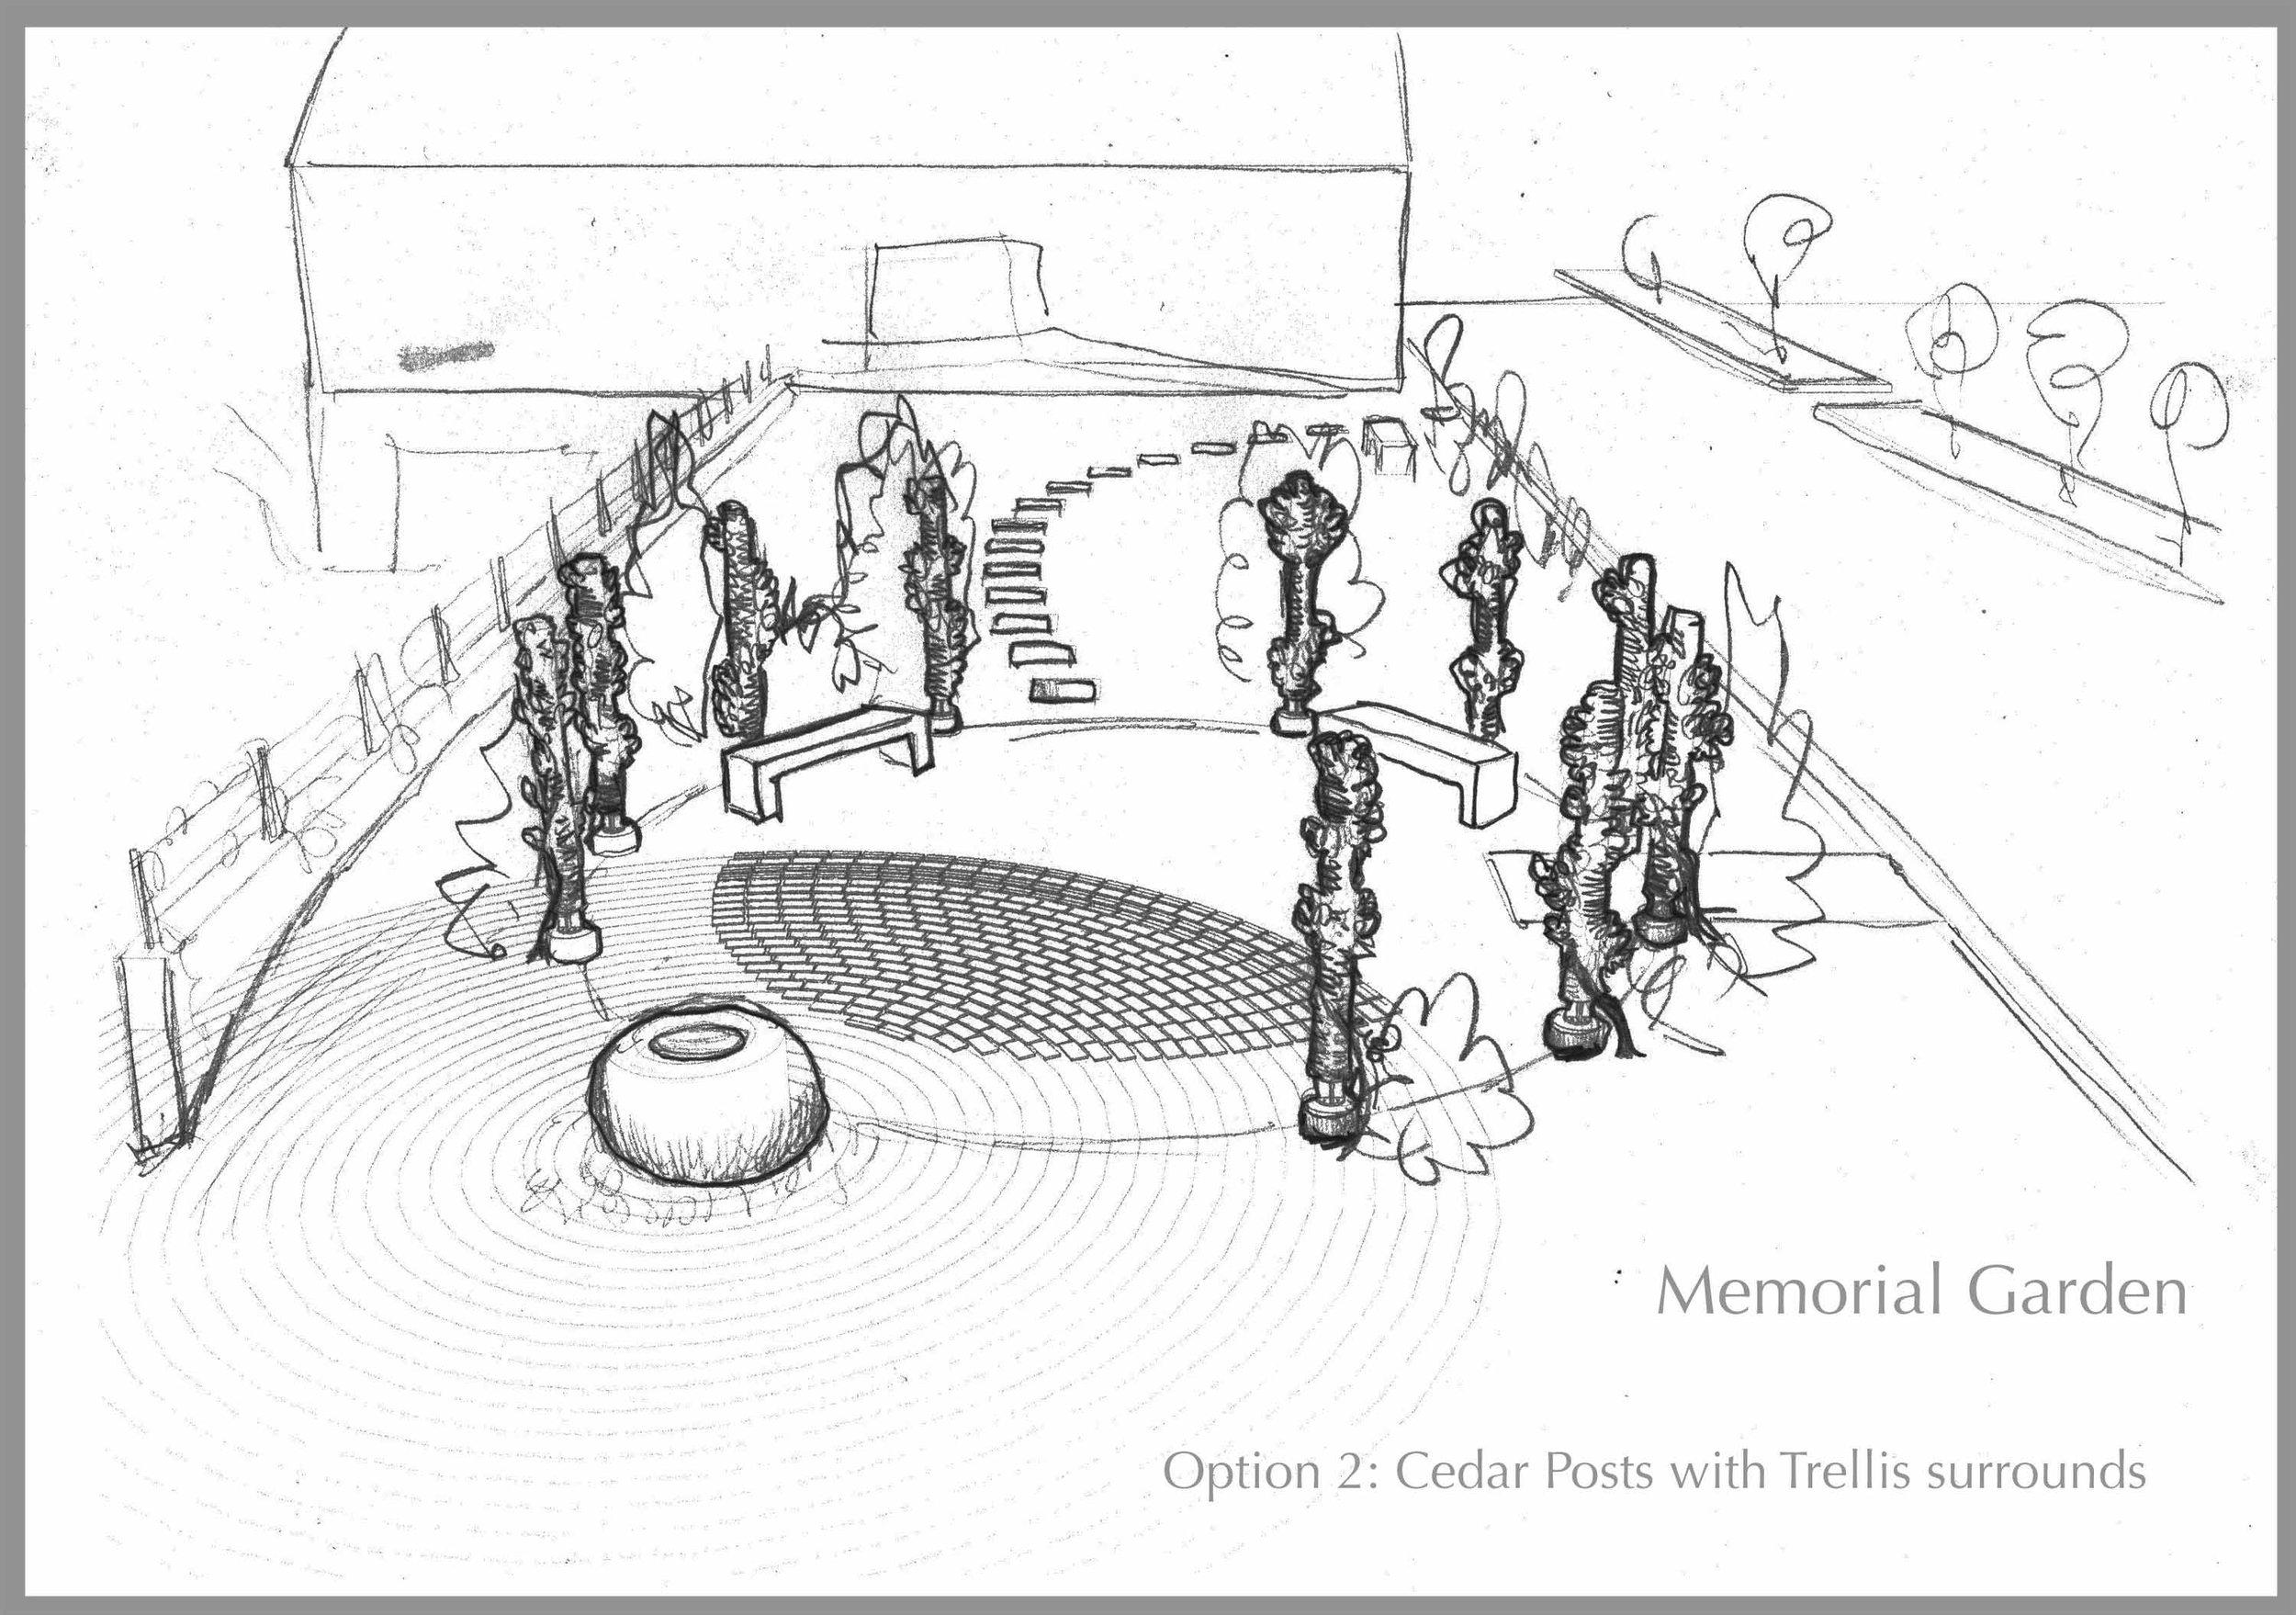 Memorial Garden sketch